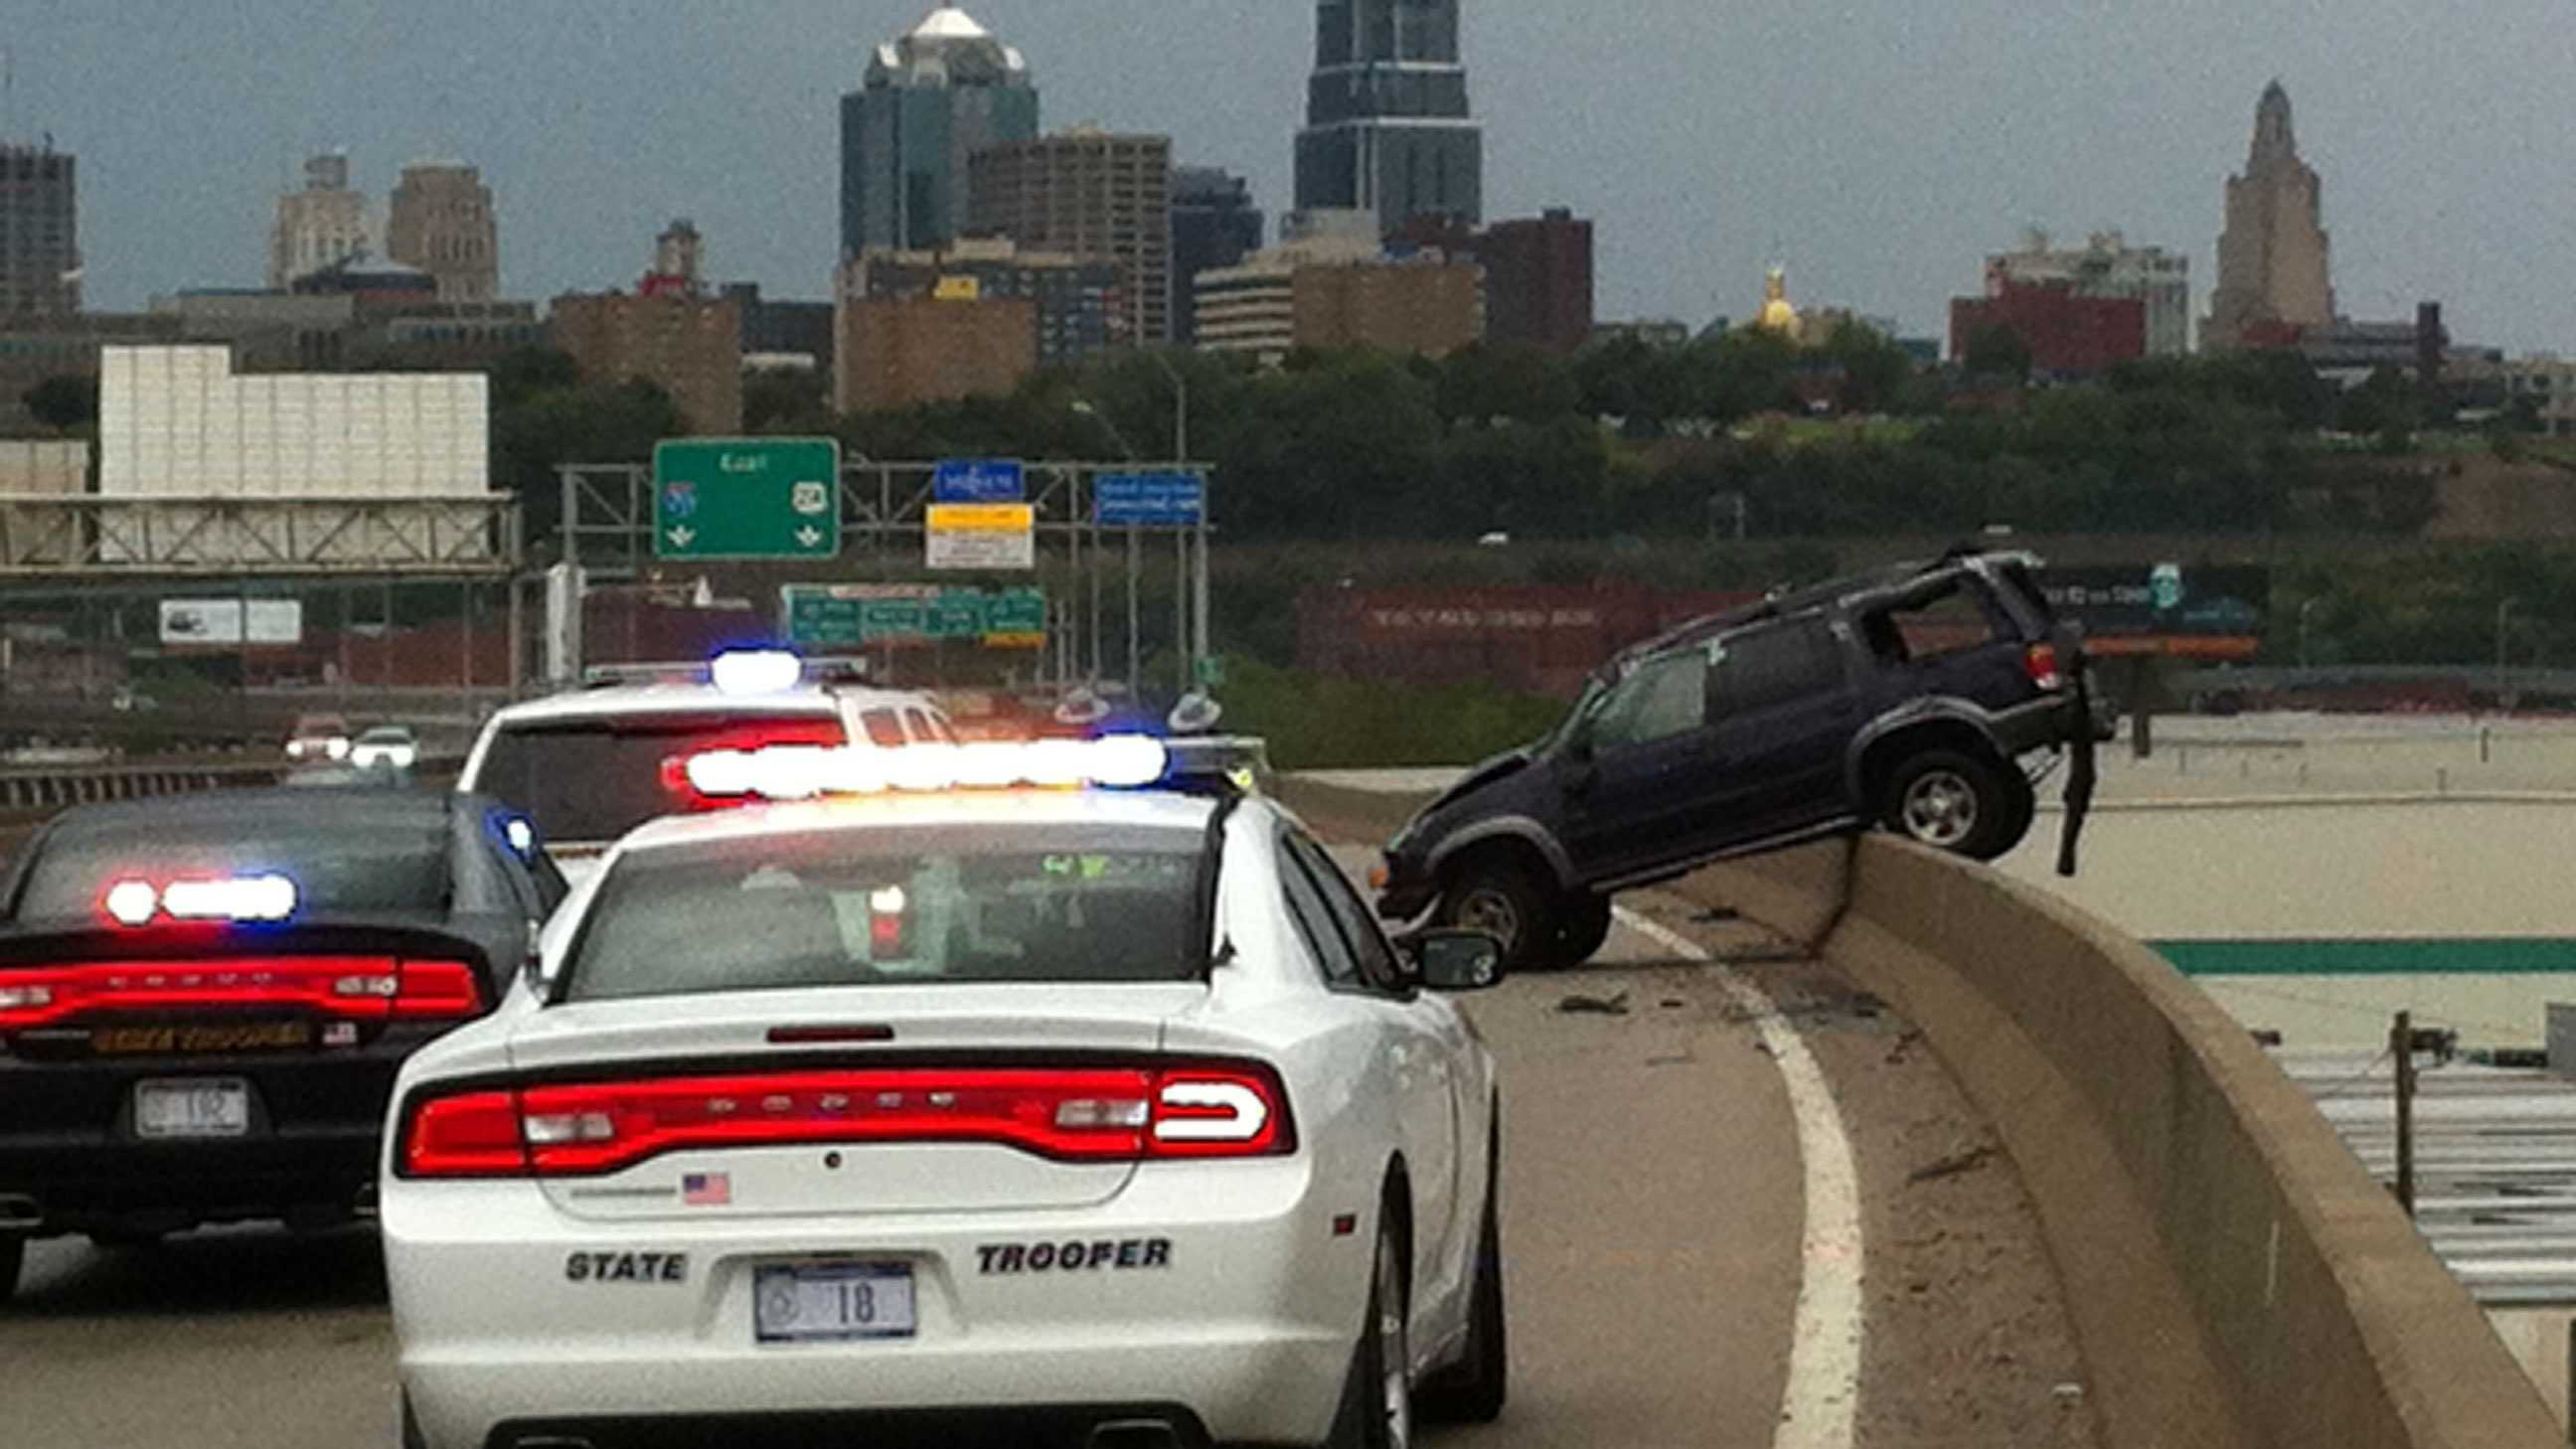 I-70, James Street wreck